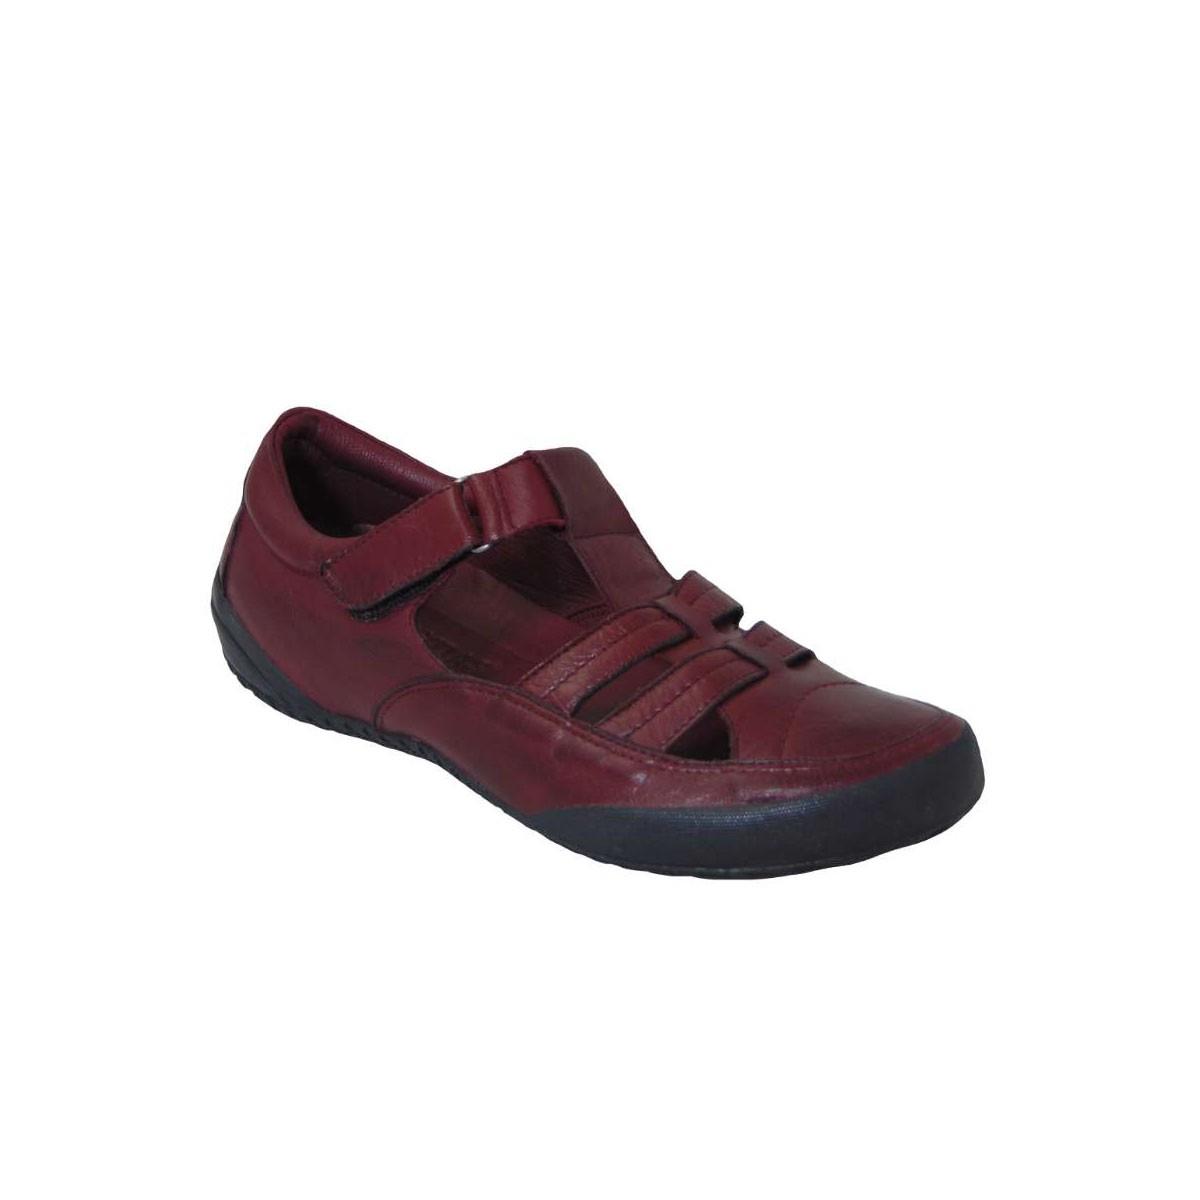 Tsimpolis Shoes 2123 Γυναικείo Casual Δερμάτινo Μπορντό